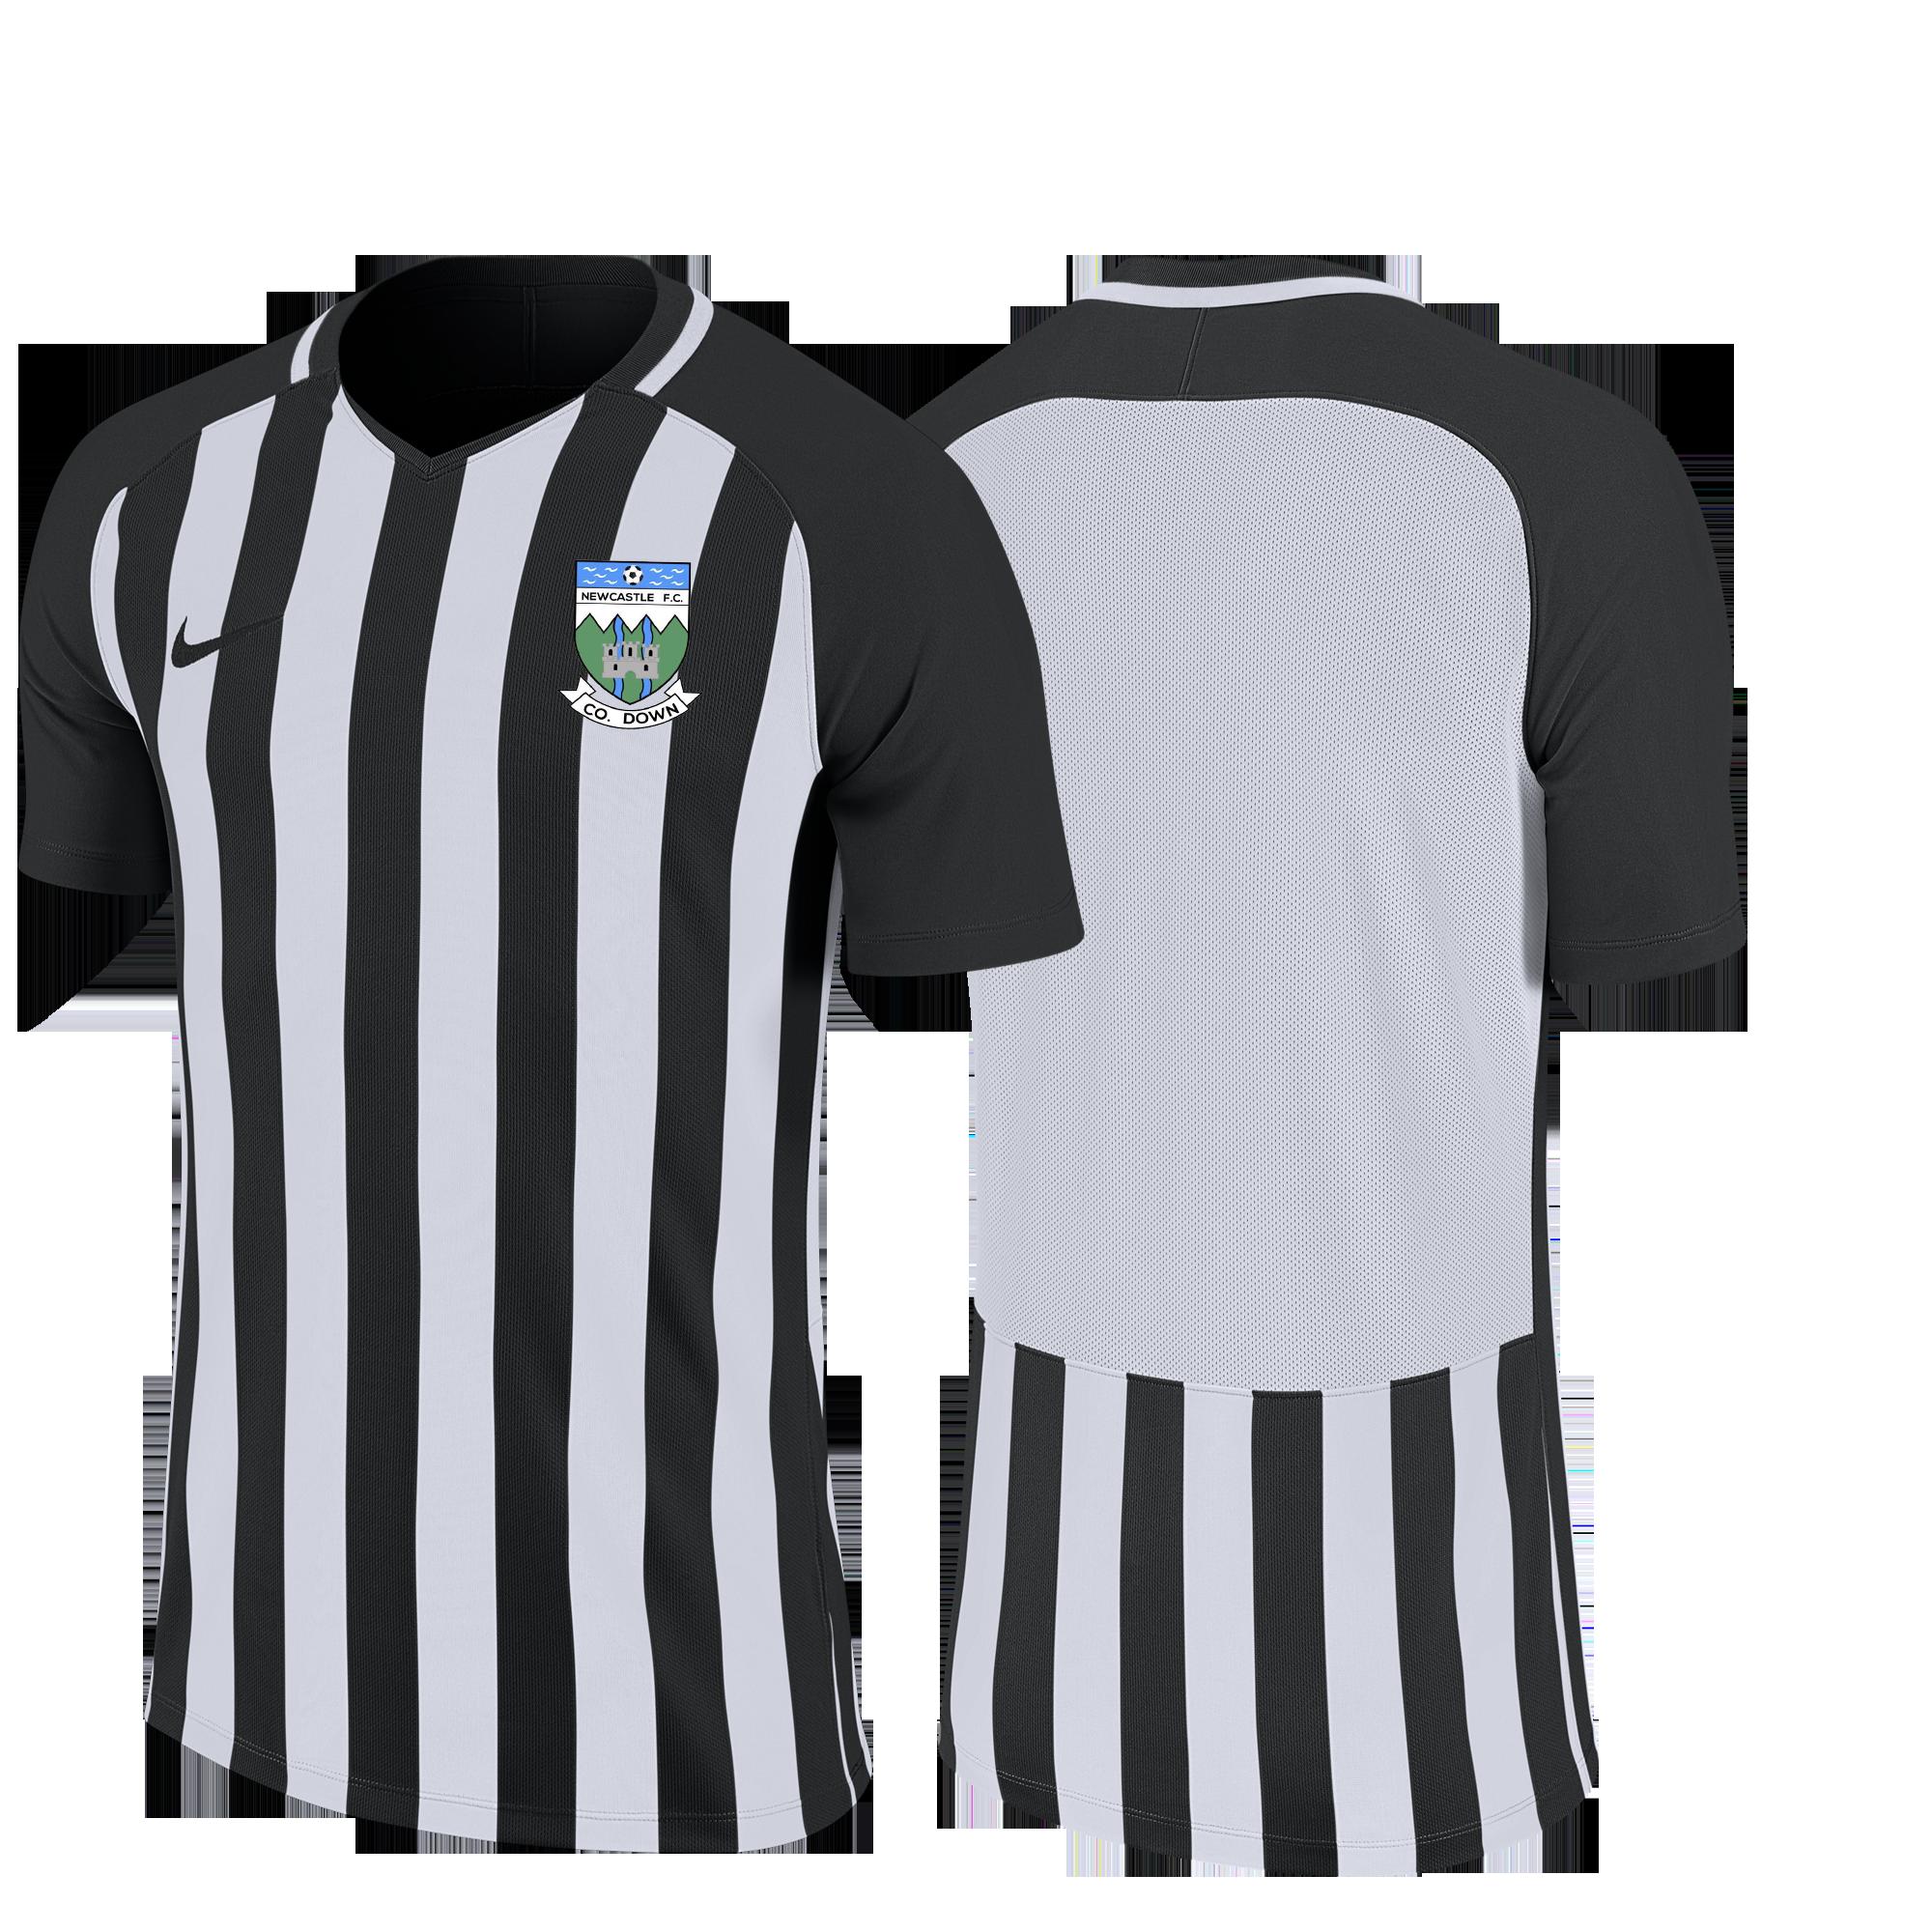 newcastle fc striped division jersey 37668 p